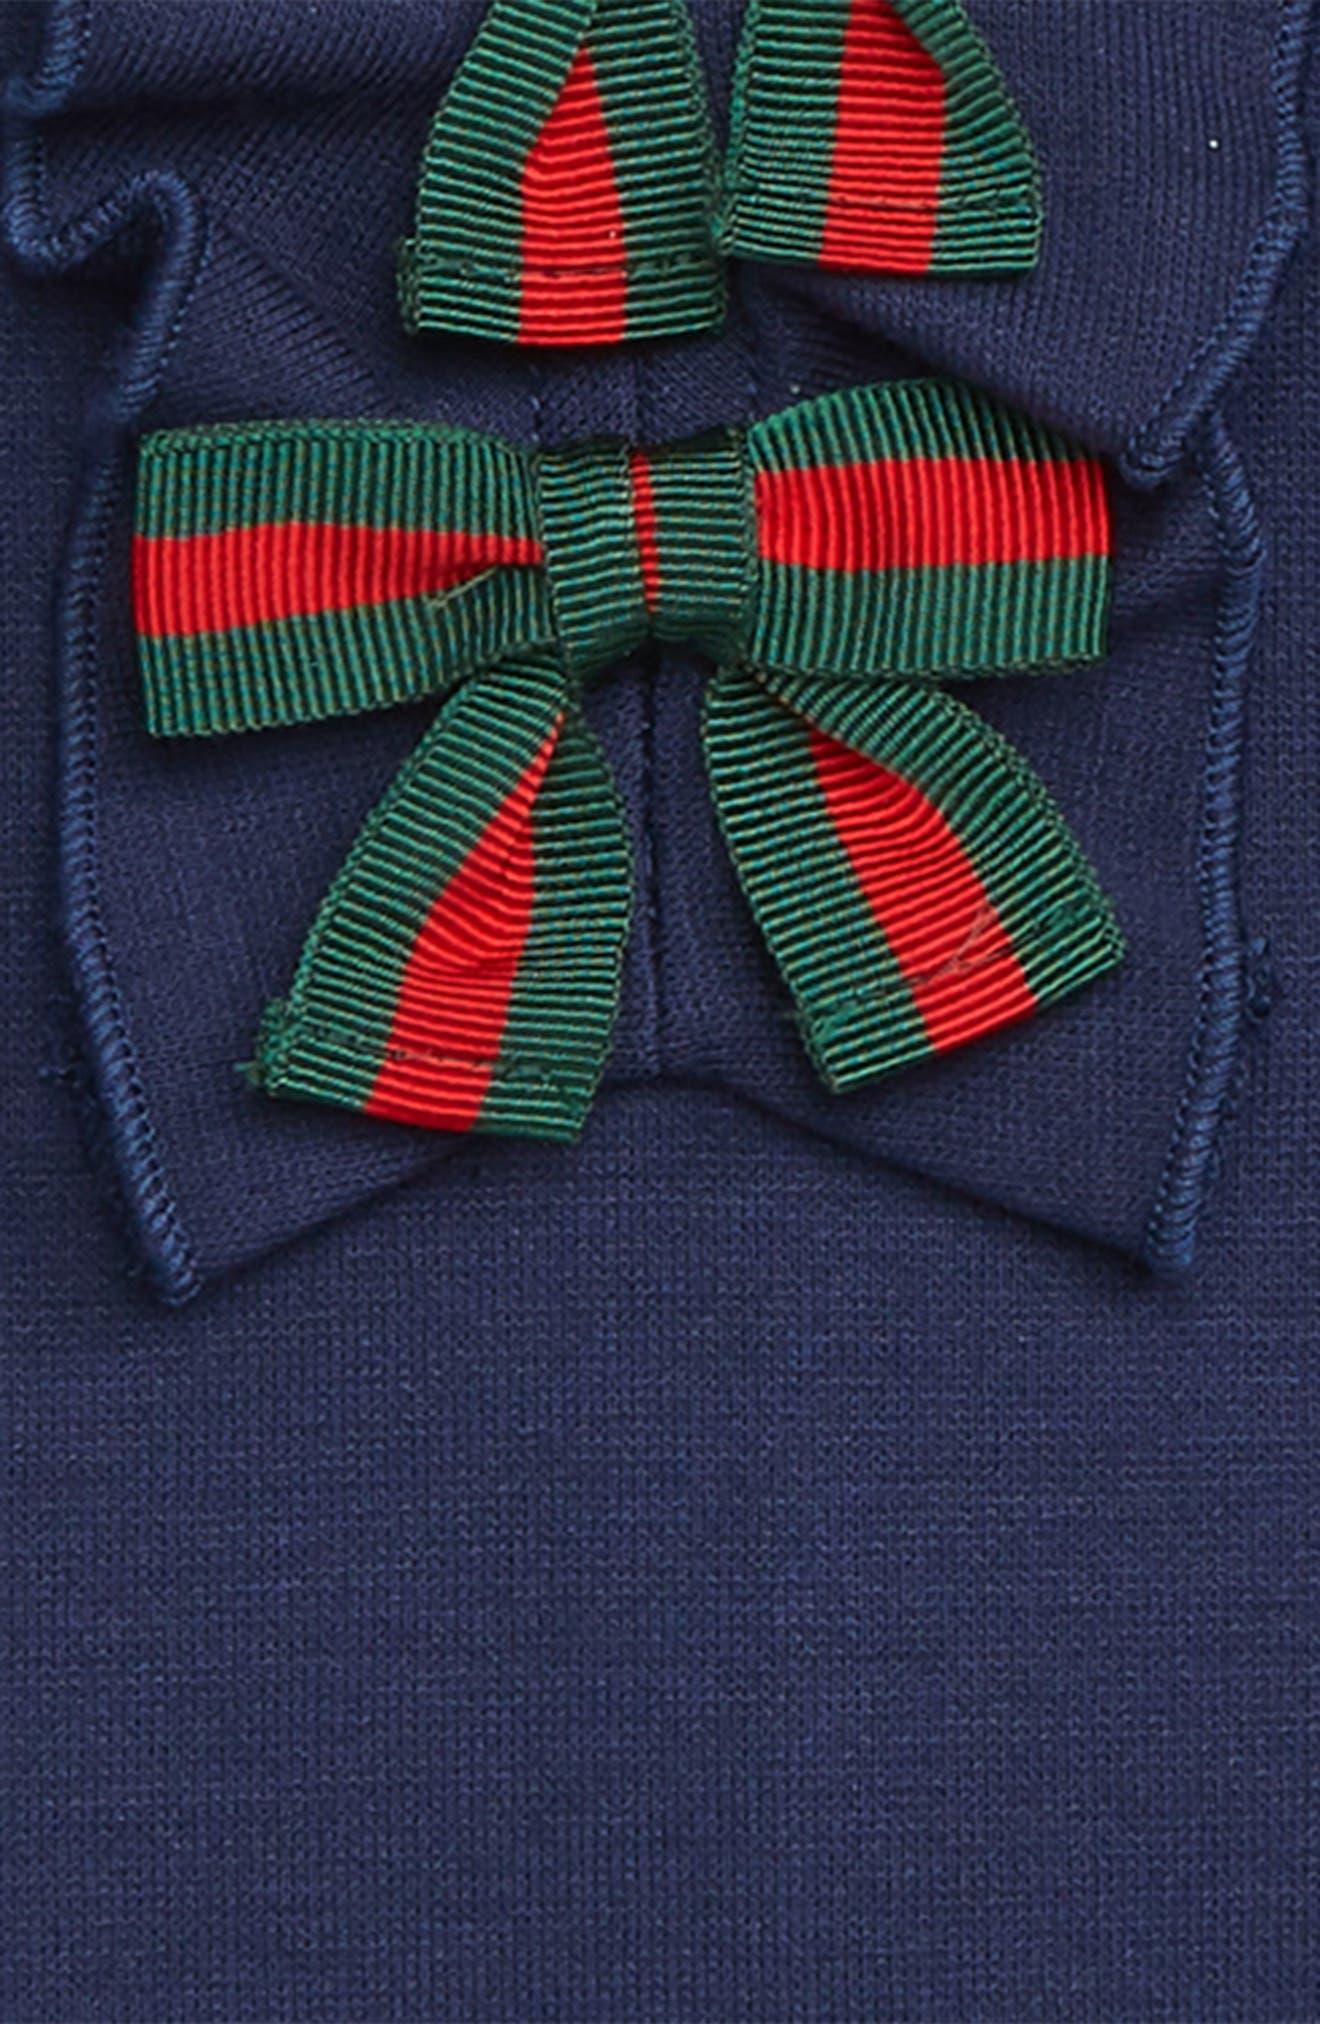 Ruffle & Bow Dress,                             Alternate thumbnail 3, color,                             COBALTO/ GREEN/ RED